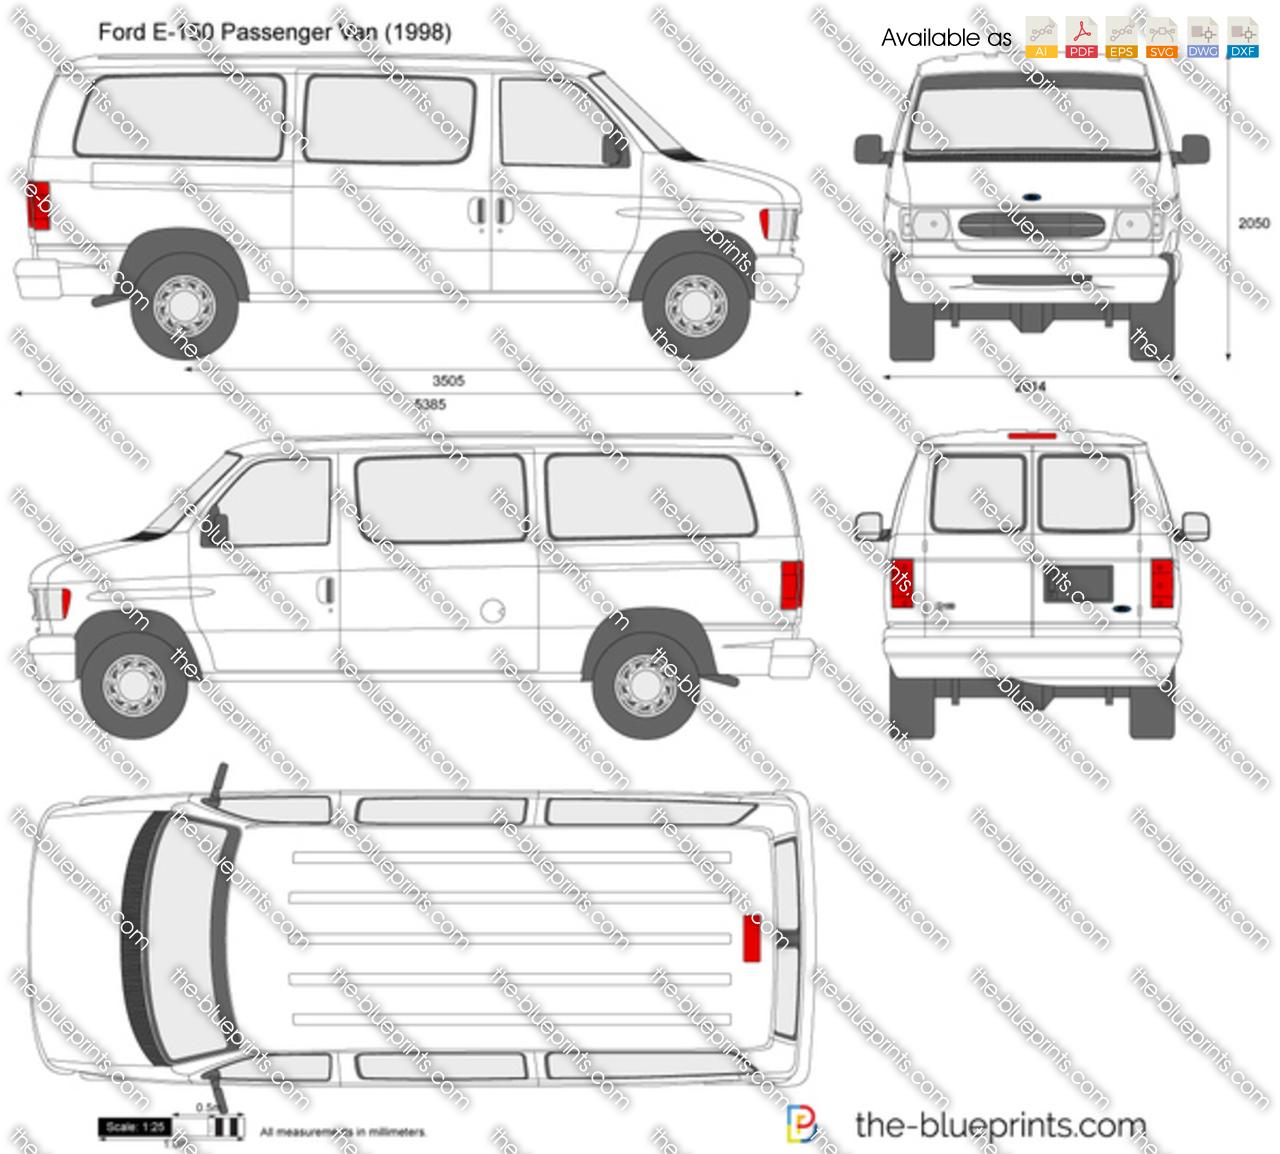 Ford E-150 Passenger Van Vector Drawing